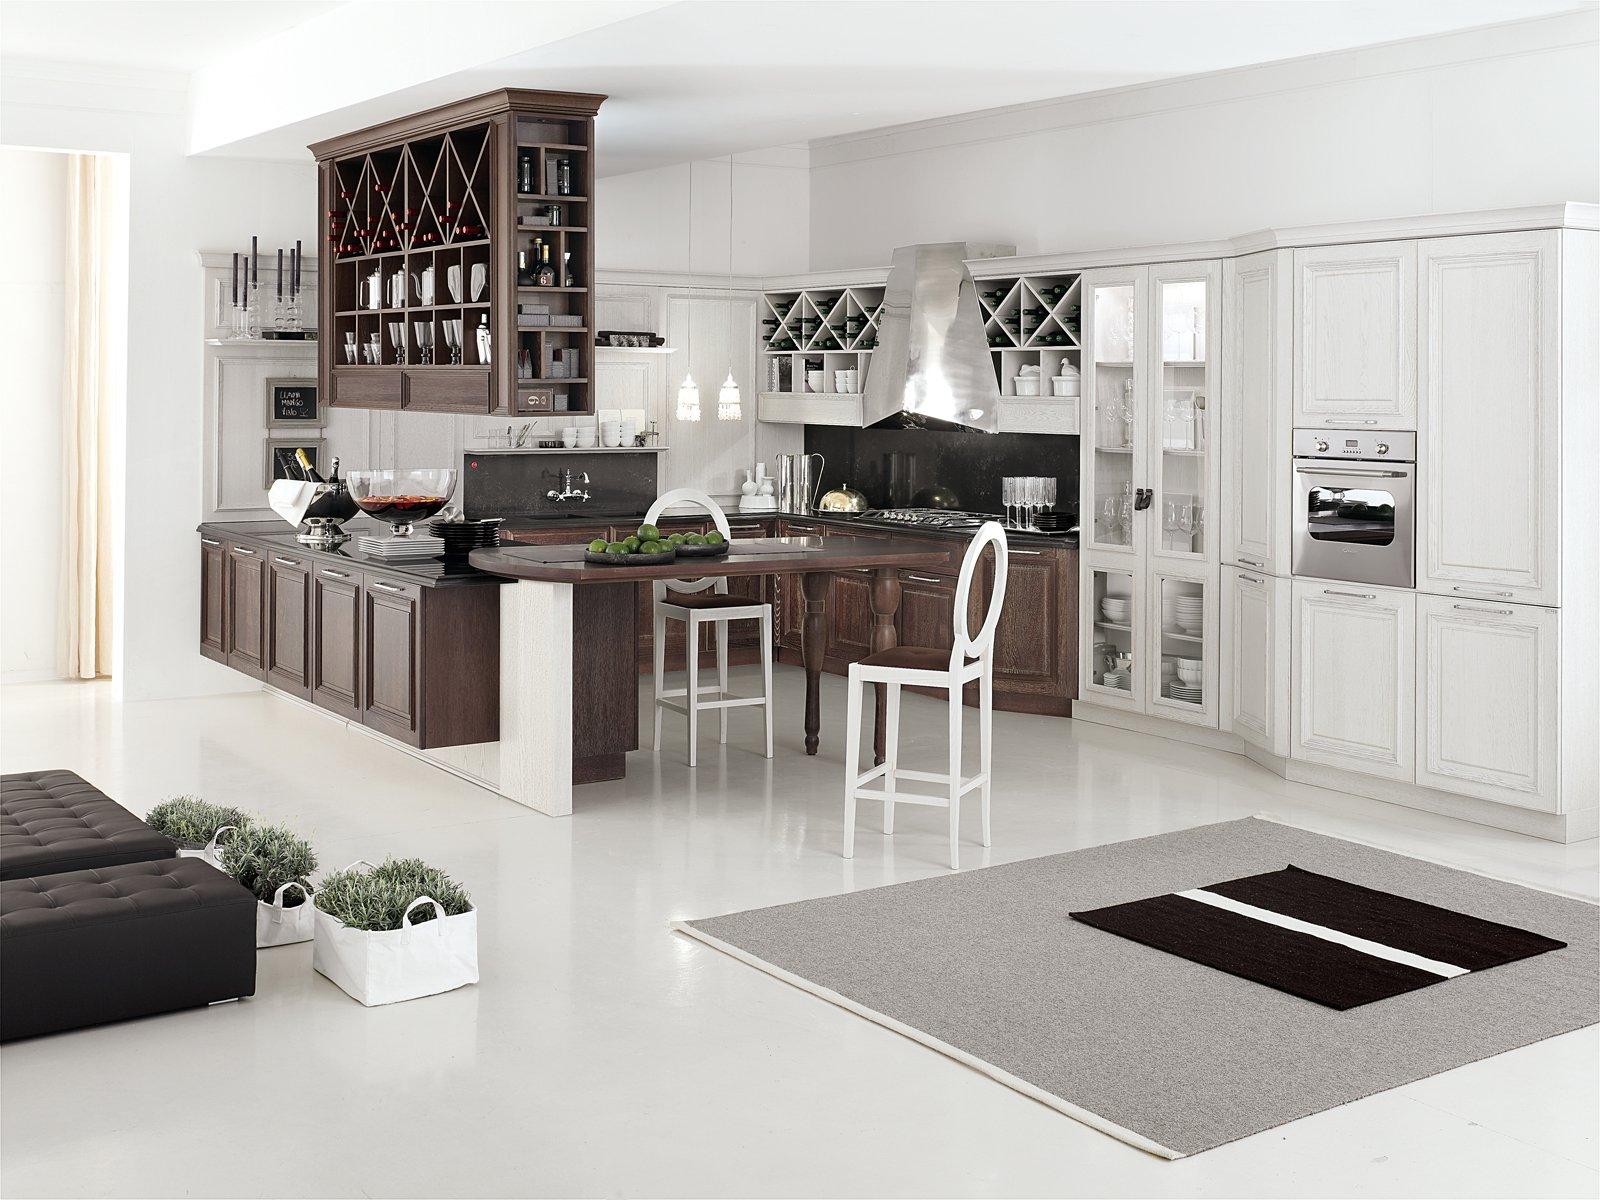 Cucine country una scelta di stile cose di casa - Aerre cucine classiche ...